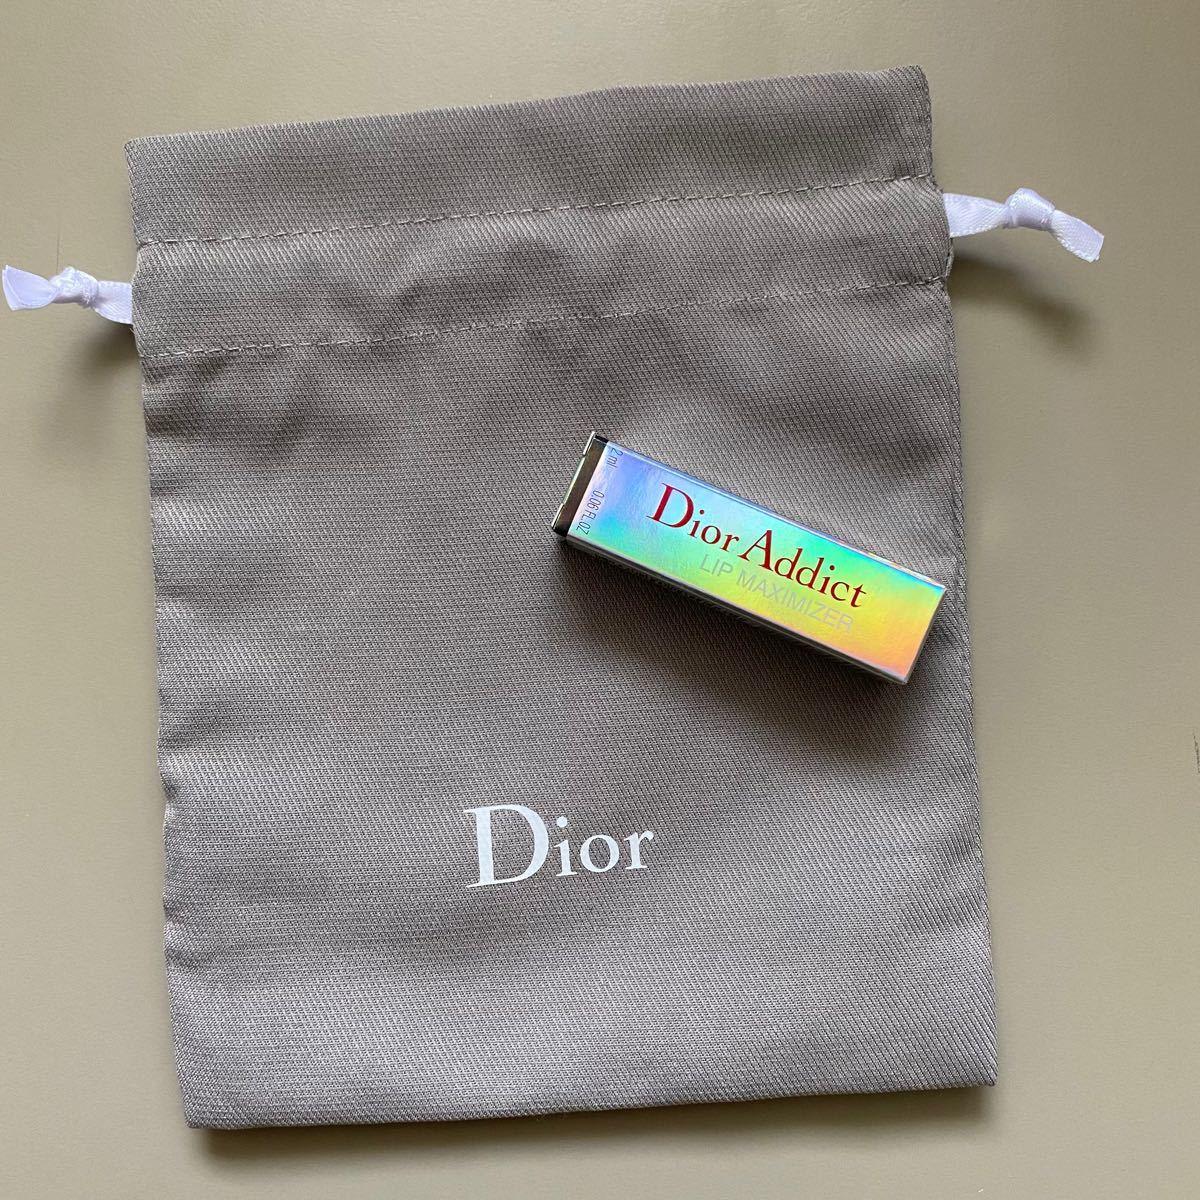 Dior ディオールアディクトリップ マキシマイザー ミニ サンプル  リップグロス 巾着 国内正規品 2ml